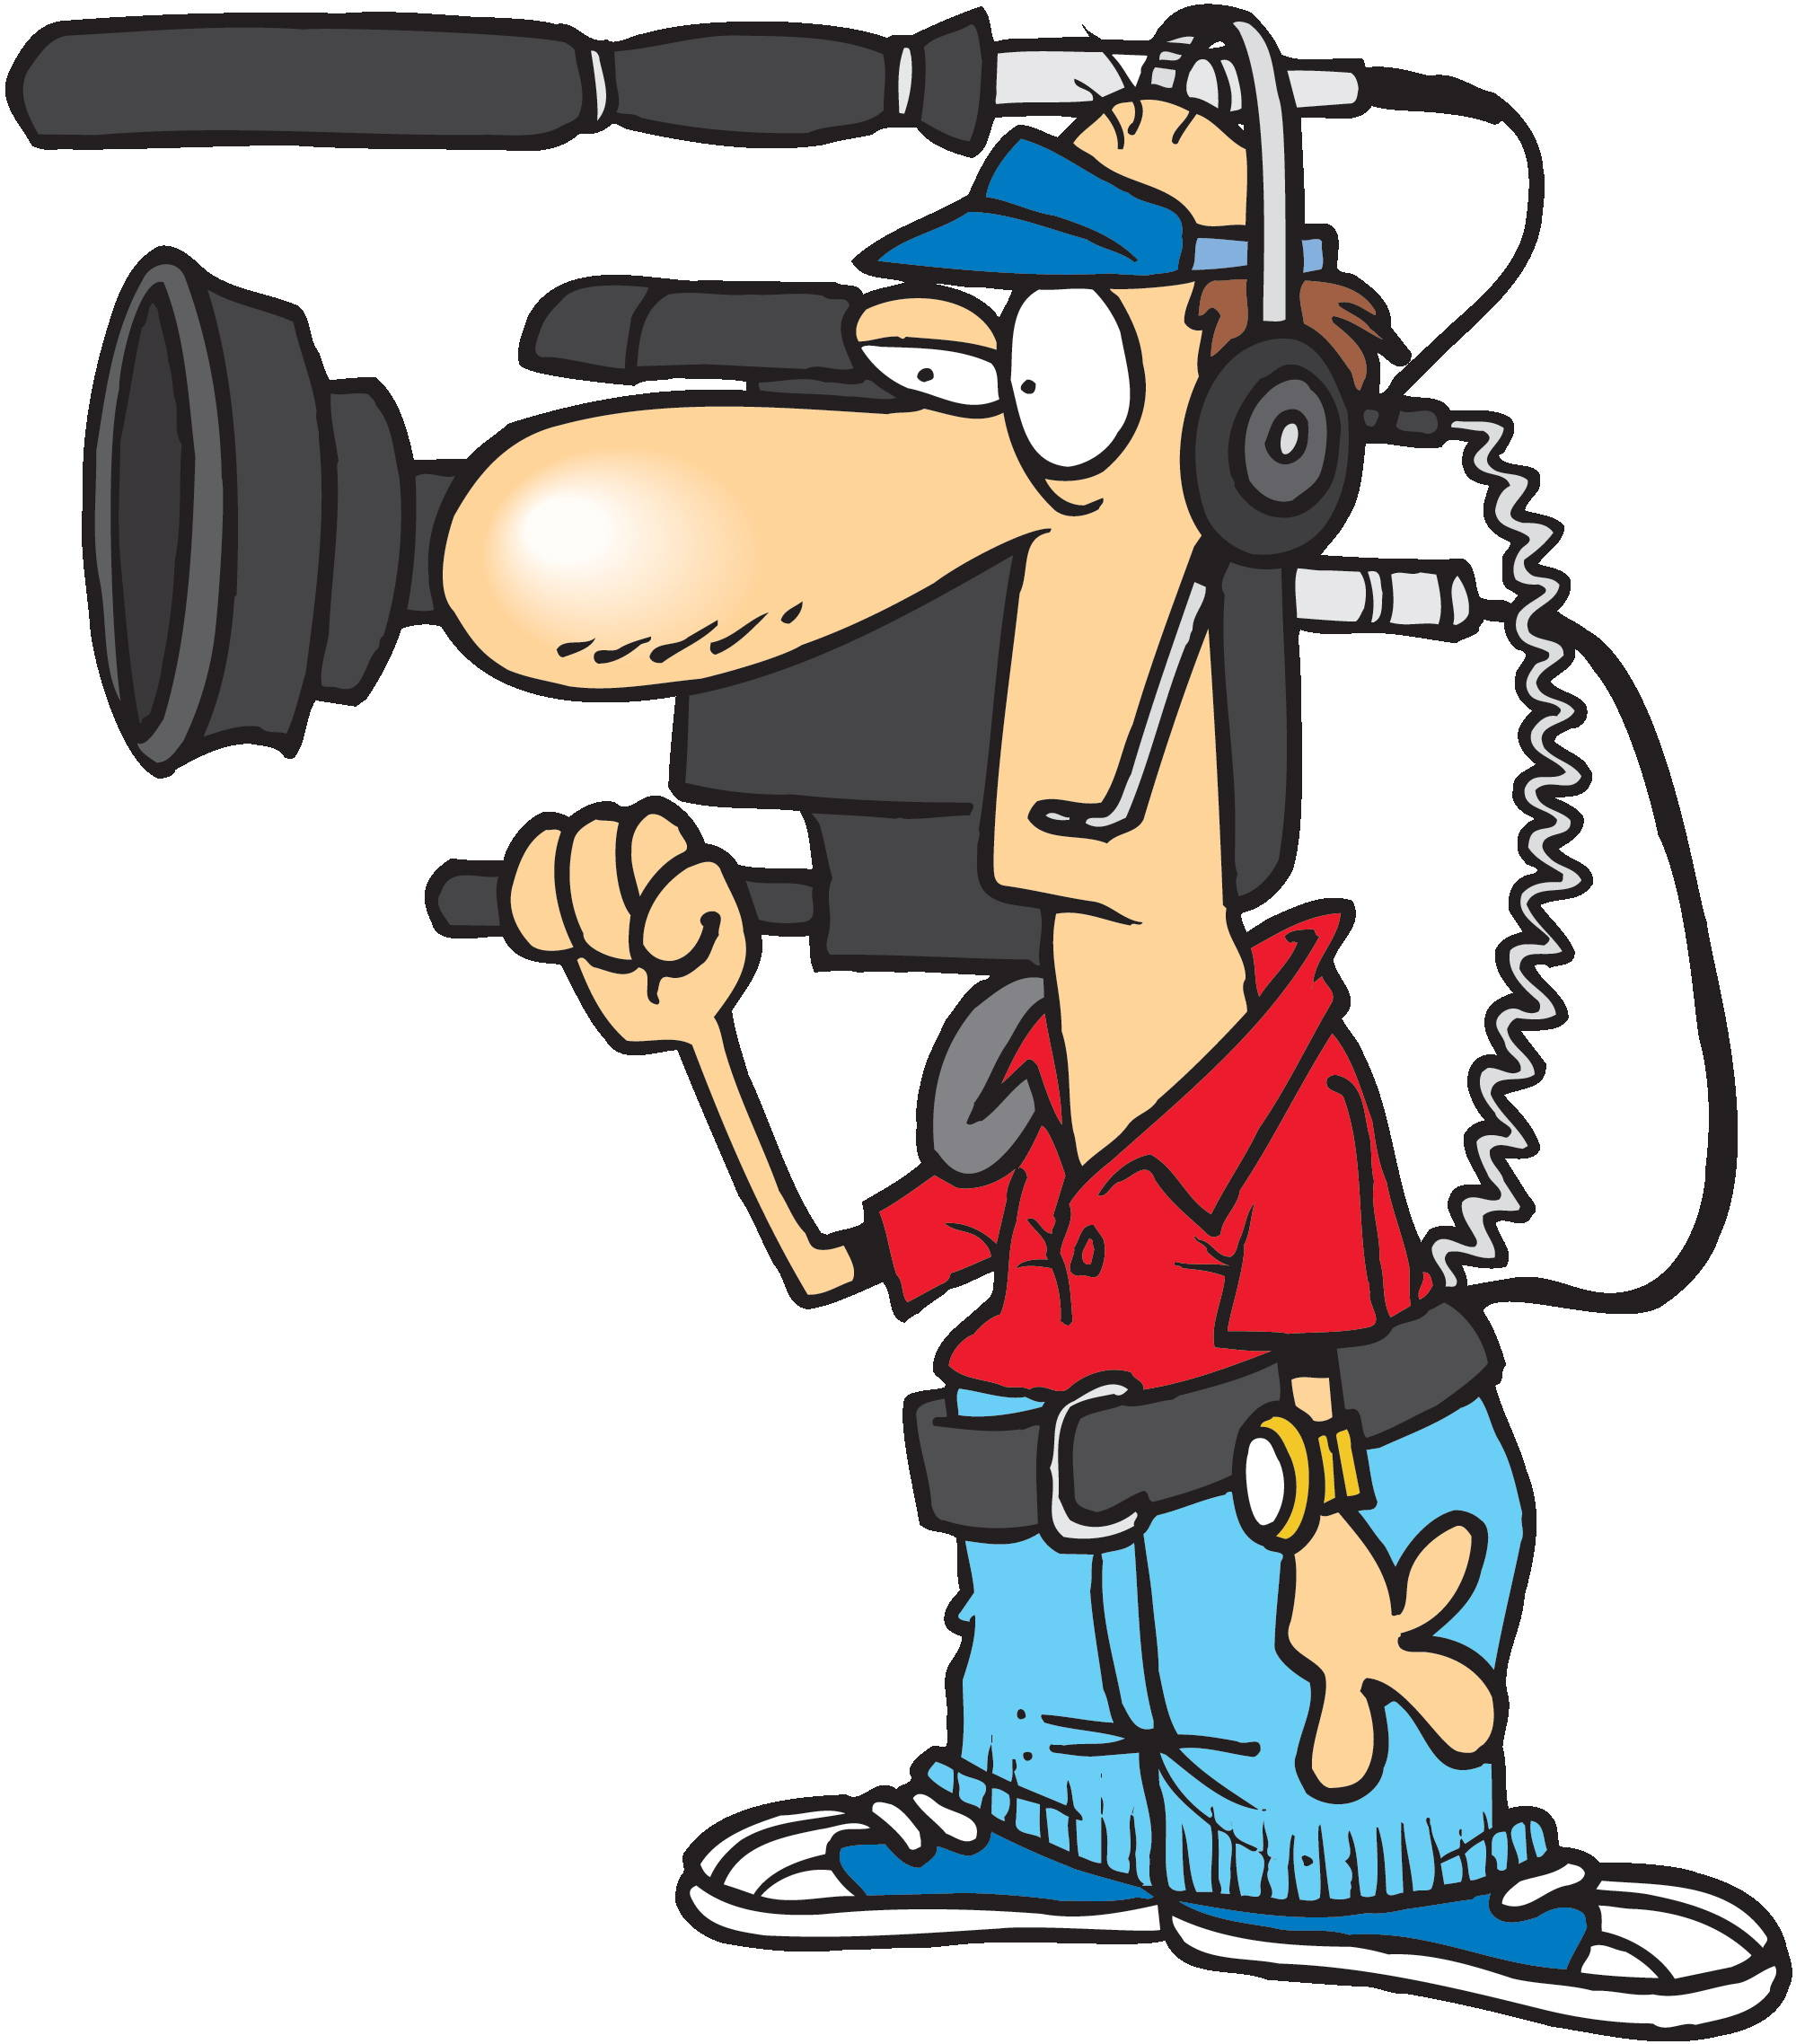 News broadcast clipart.